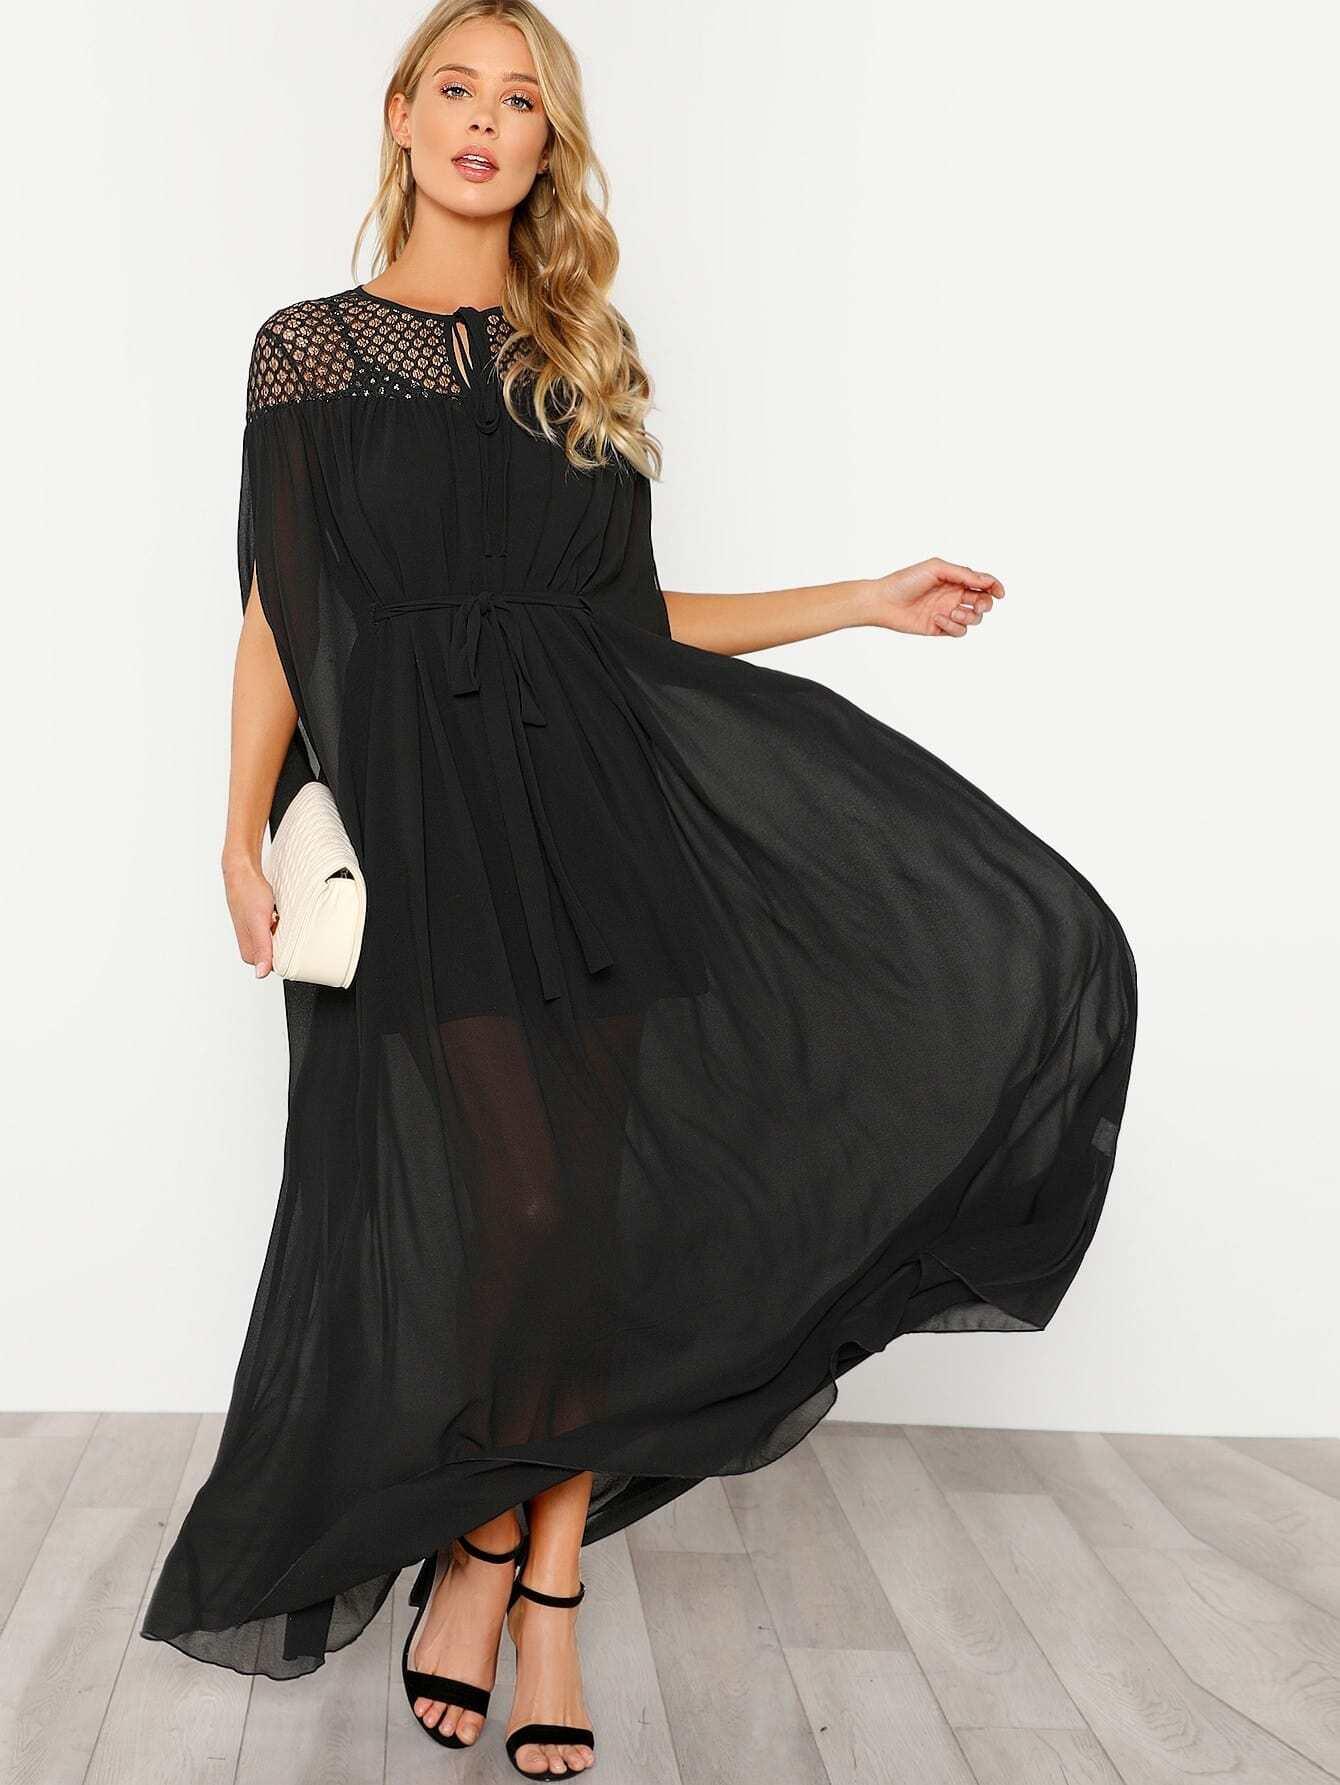 Lace Yoke Tie Neck Semi Sheer Tent Dress